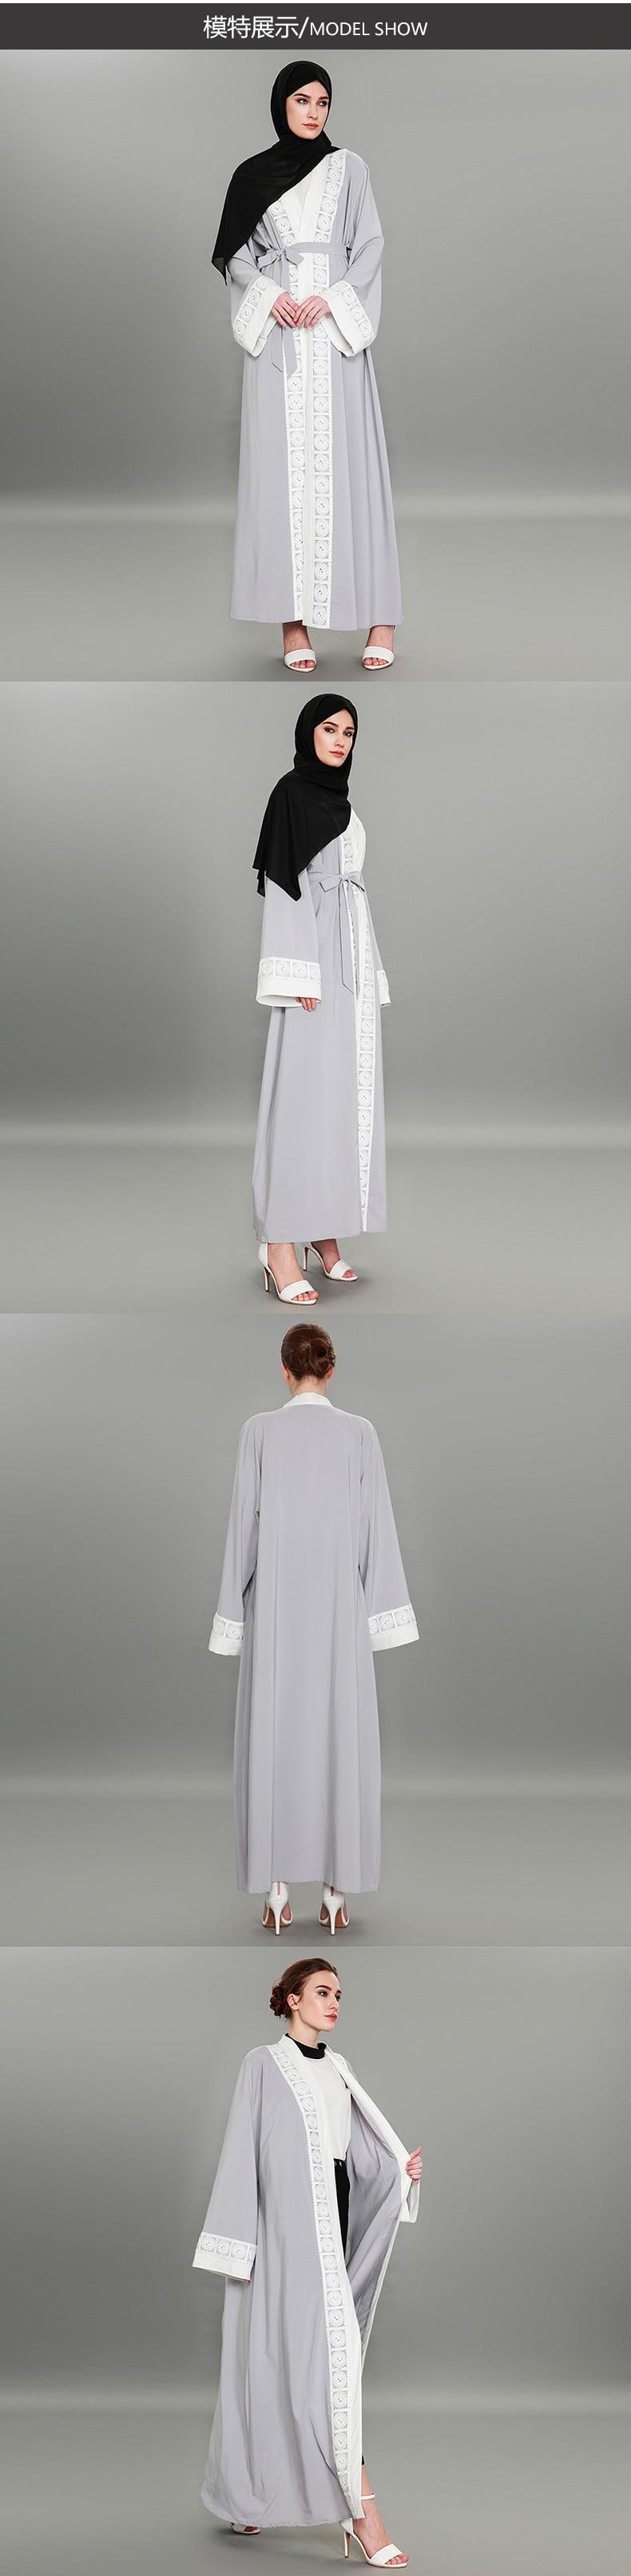 Nova costura rendas moda oriente médio robes